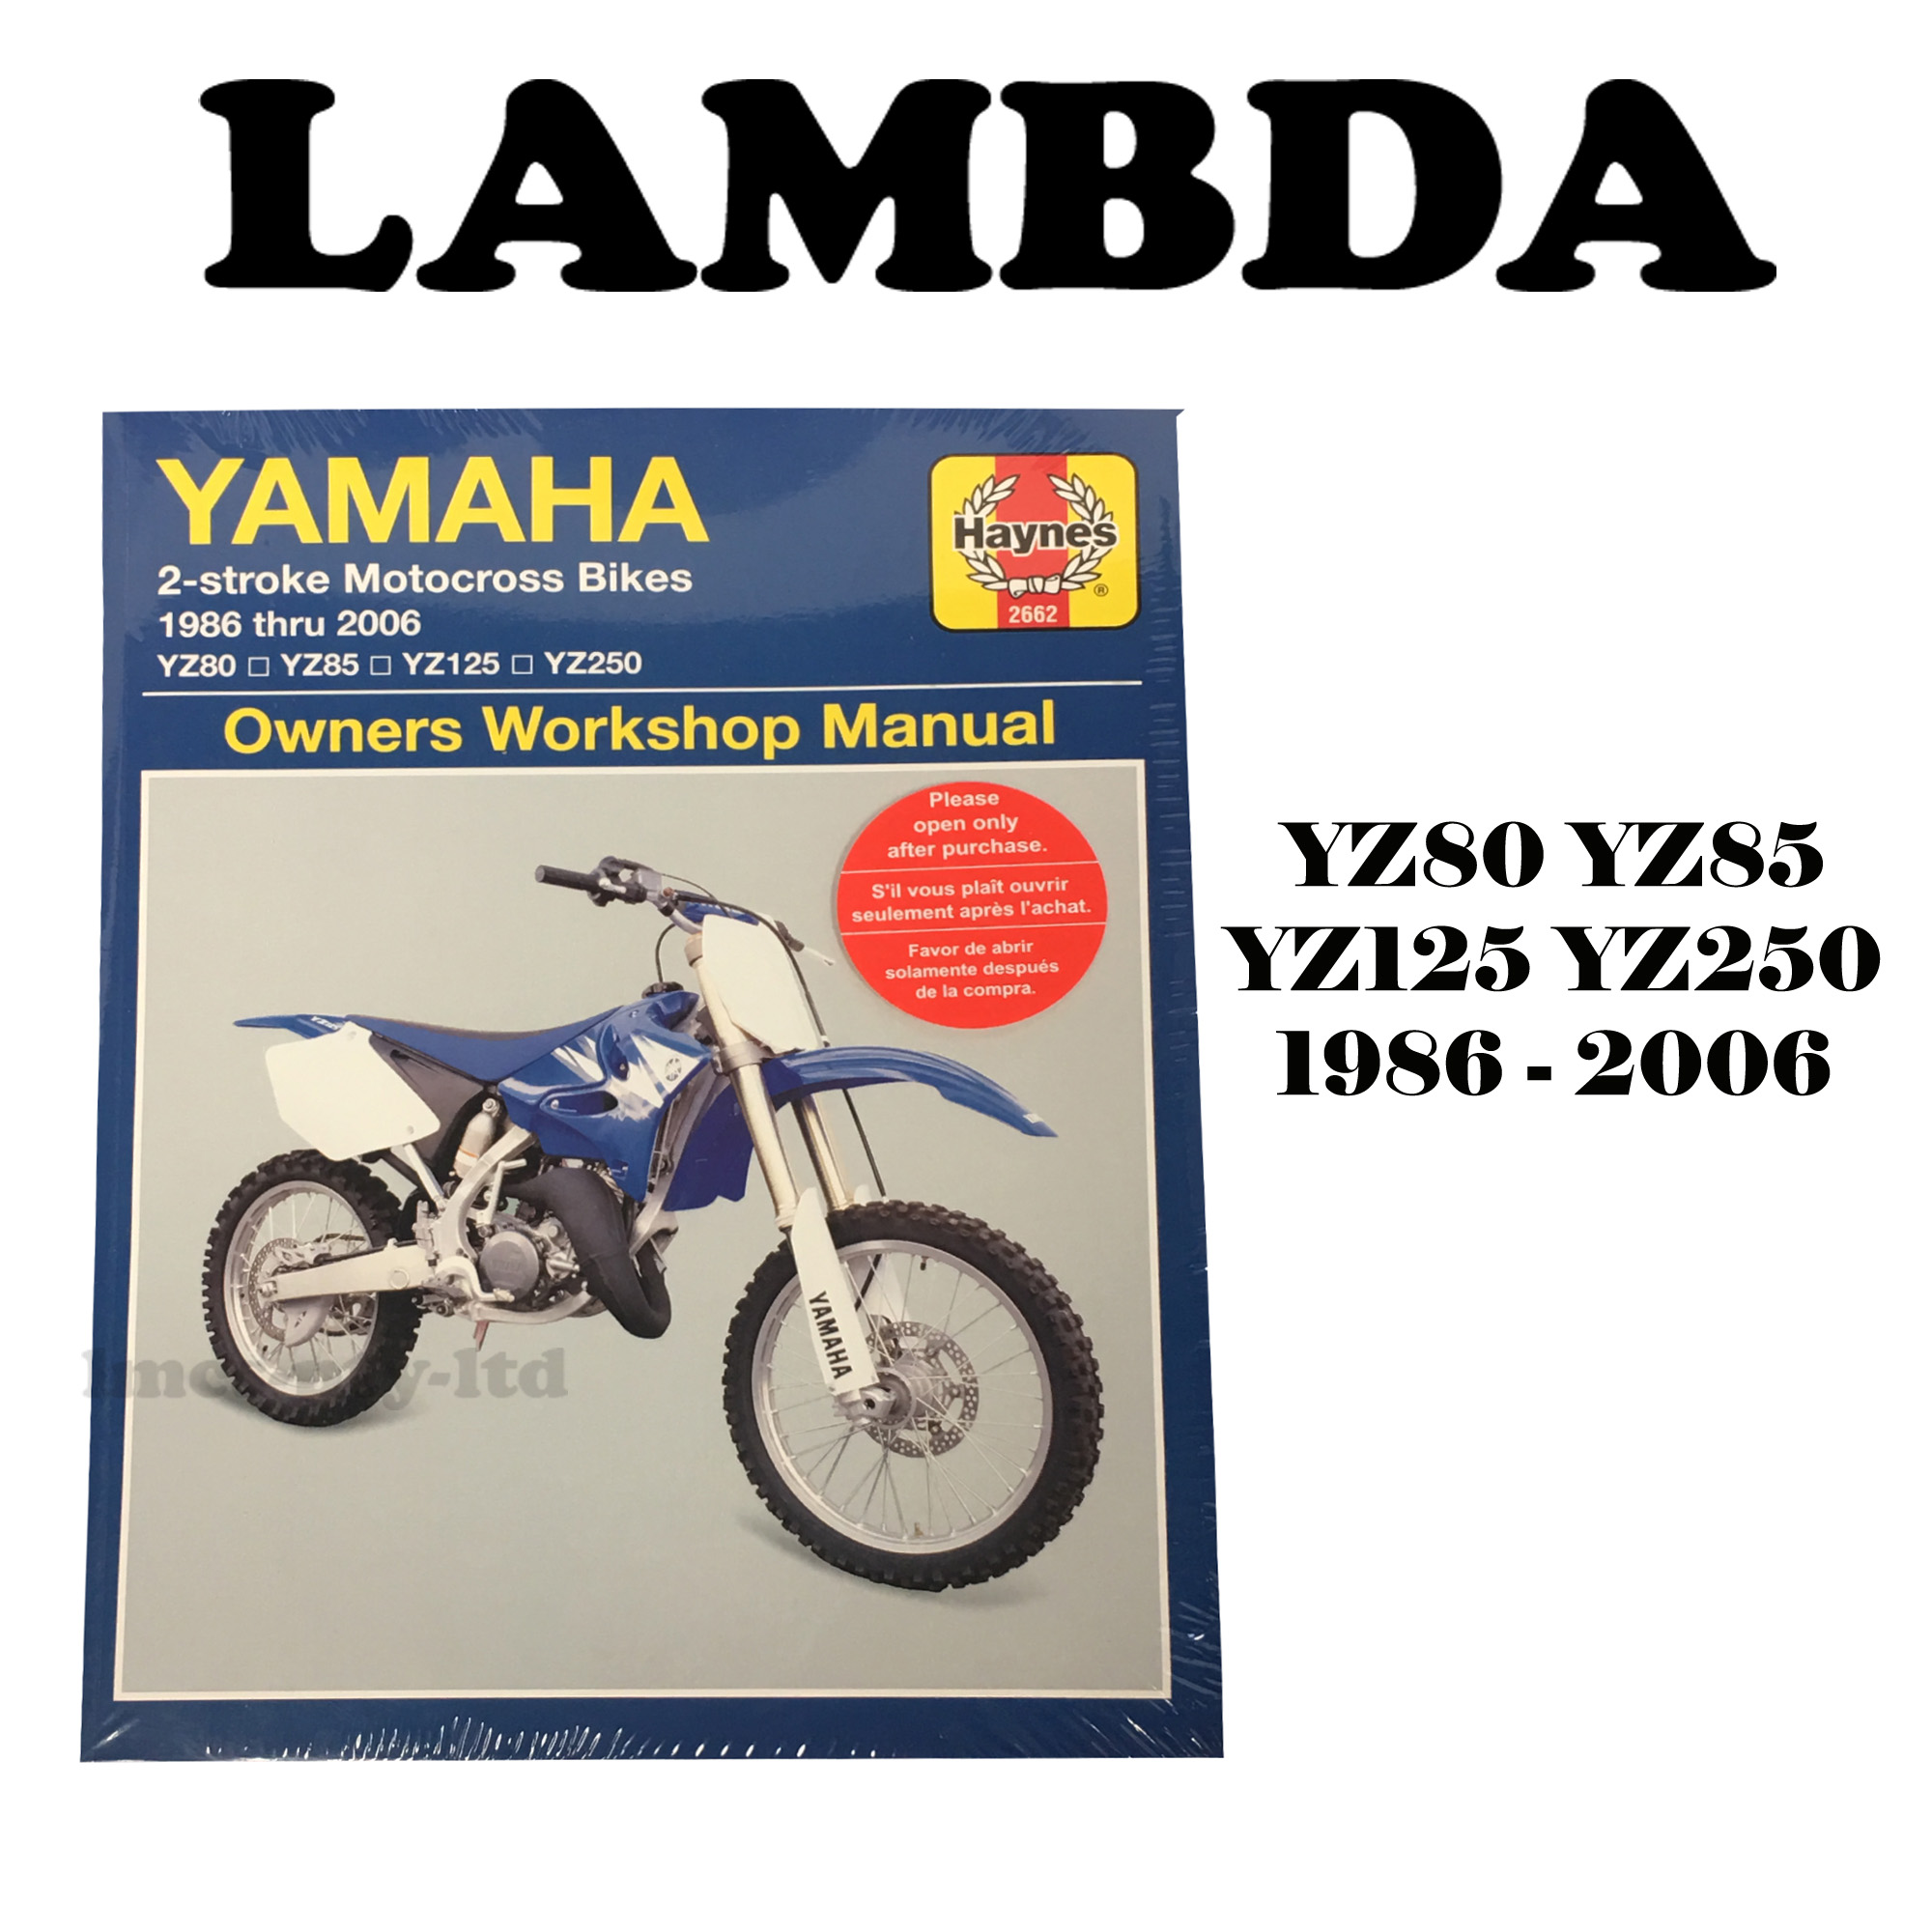 Manual Book By Haynes For Yamaha Yz80 Yz85 Yz125 Yz250